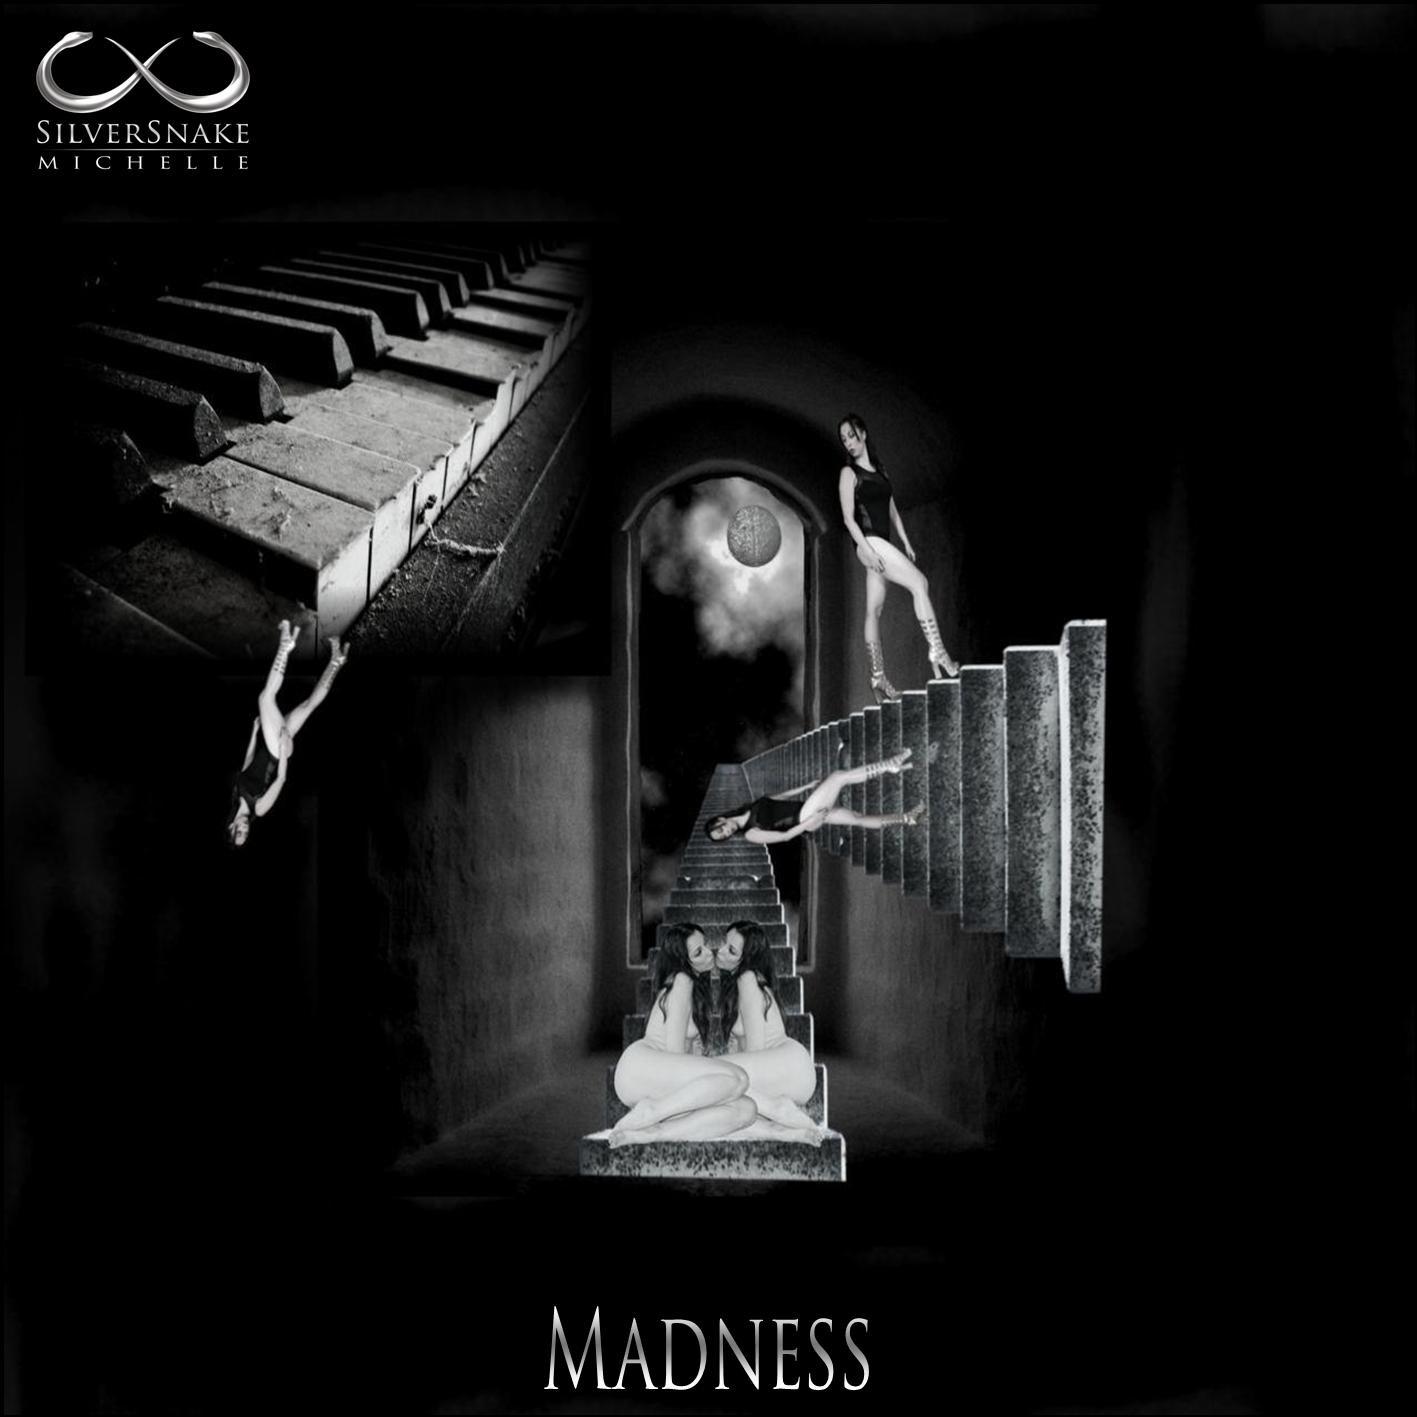 Silversnake Michelle Madness